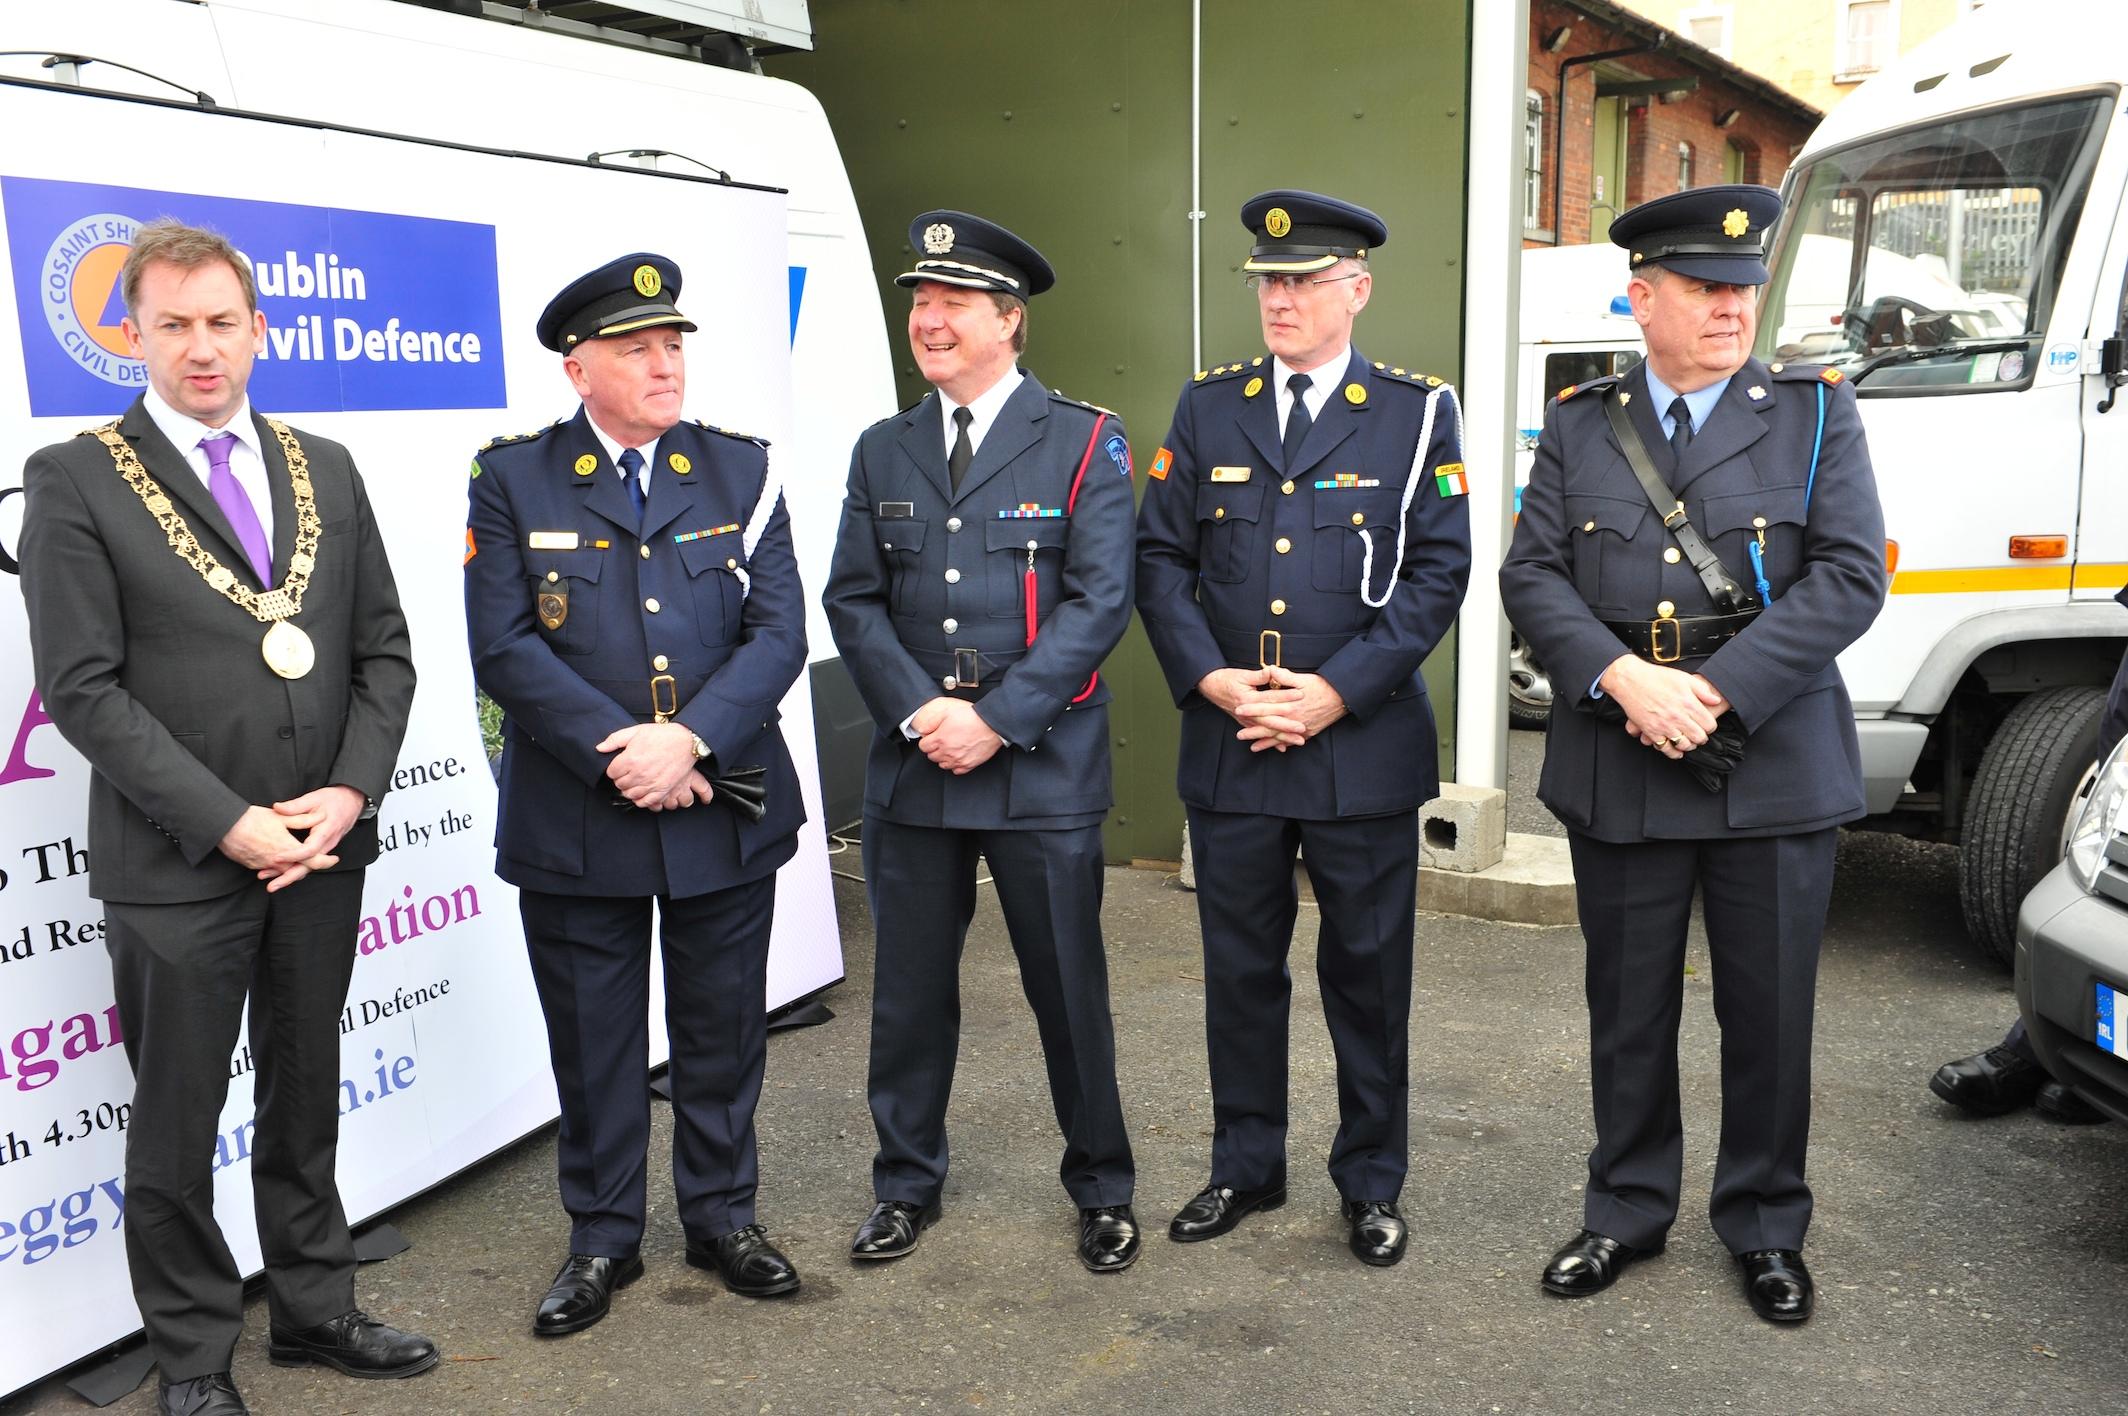 Max Dublin Civil Defence K9 Unit